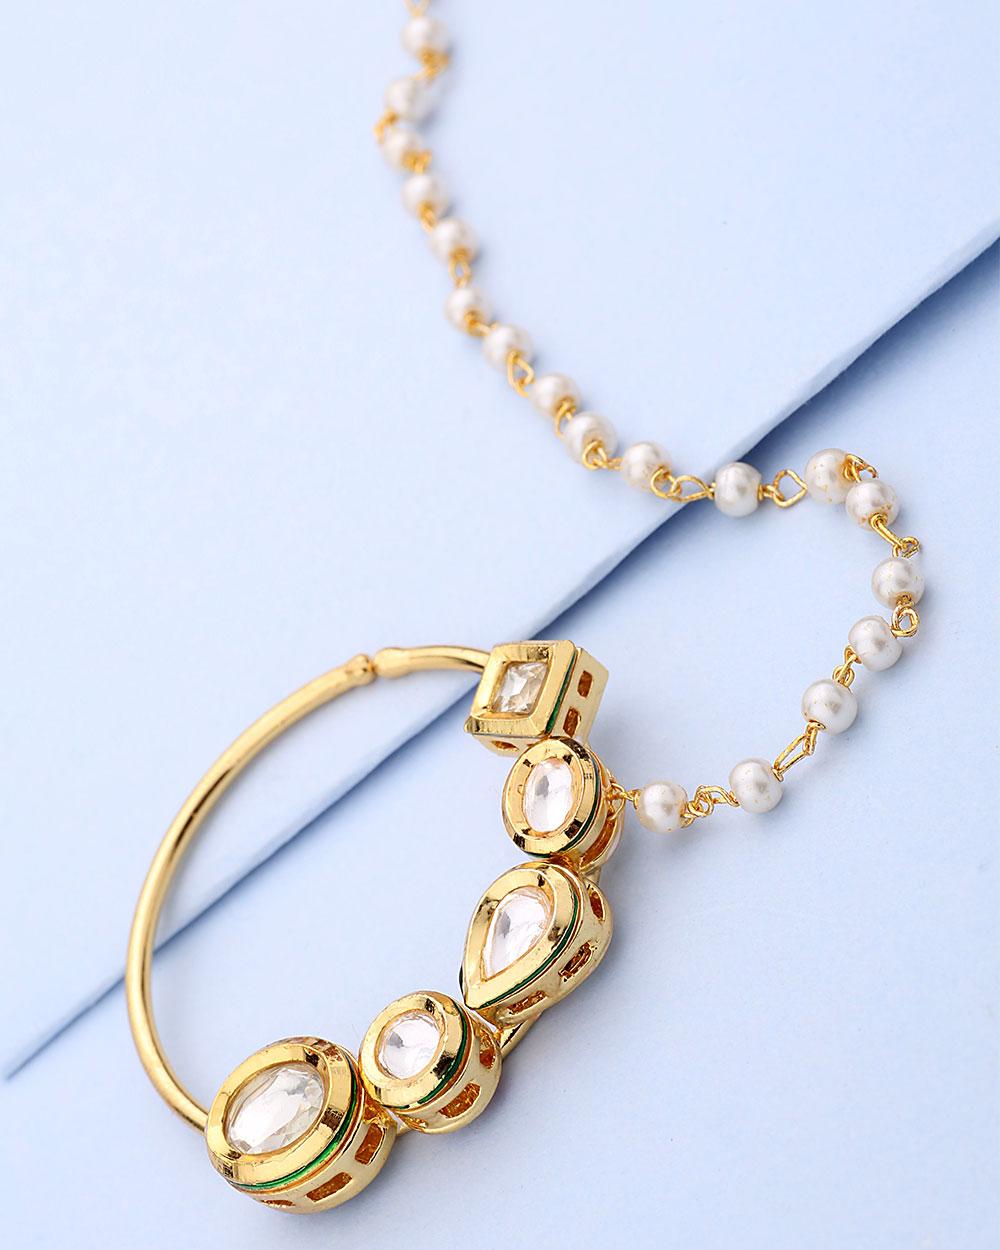 Yellow Gold Plated Kundan Nath-Style Nose Pin | Buy Designer ...